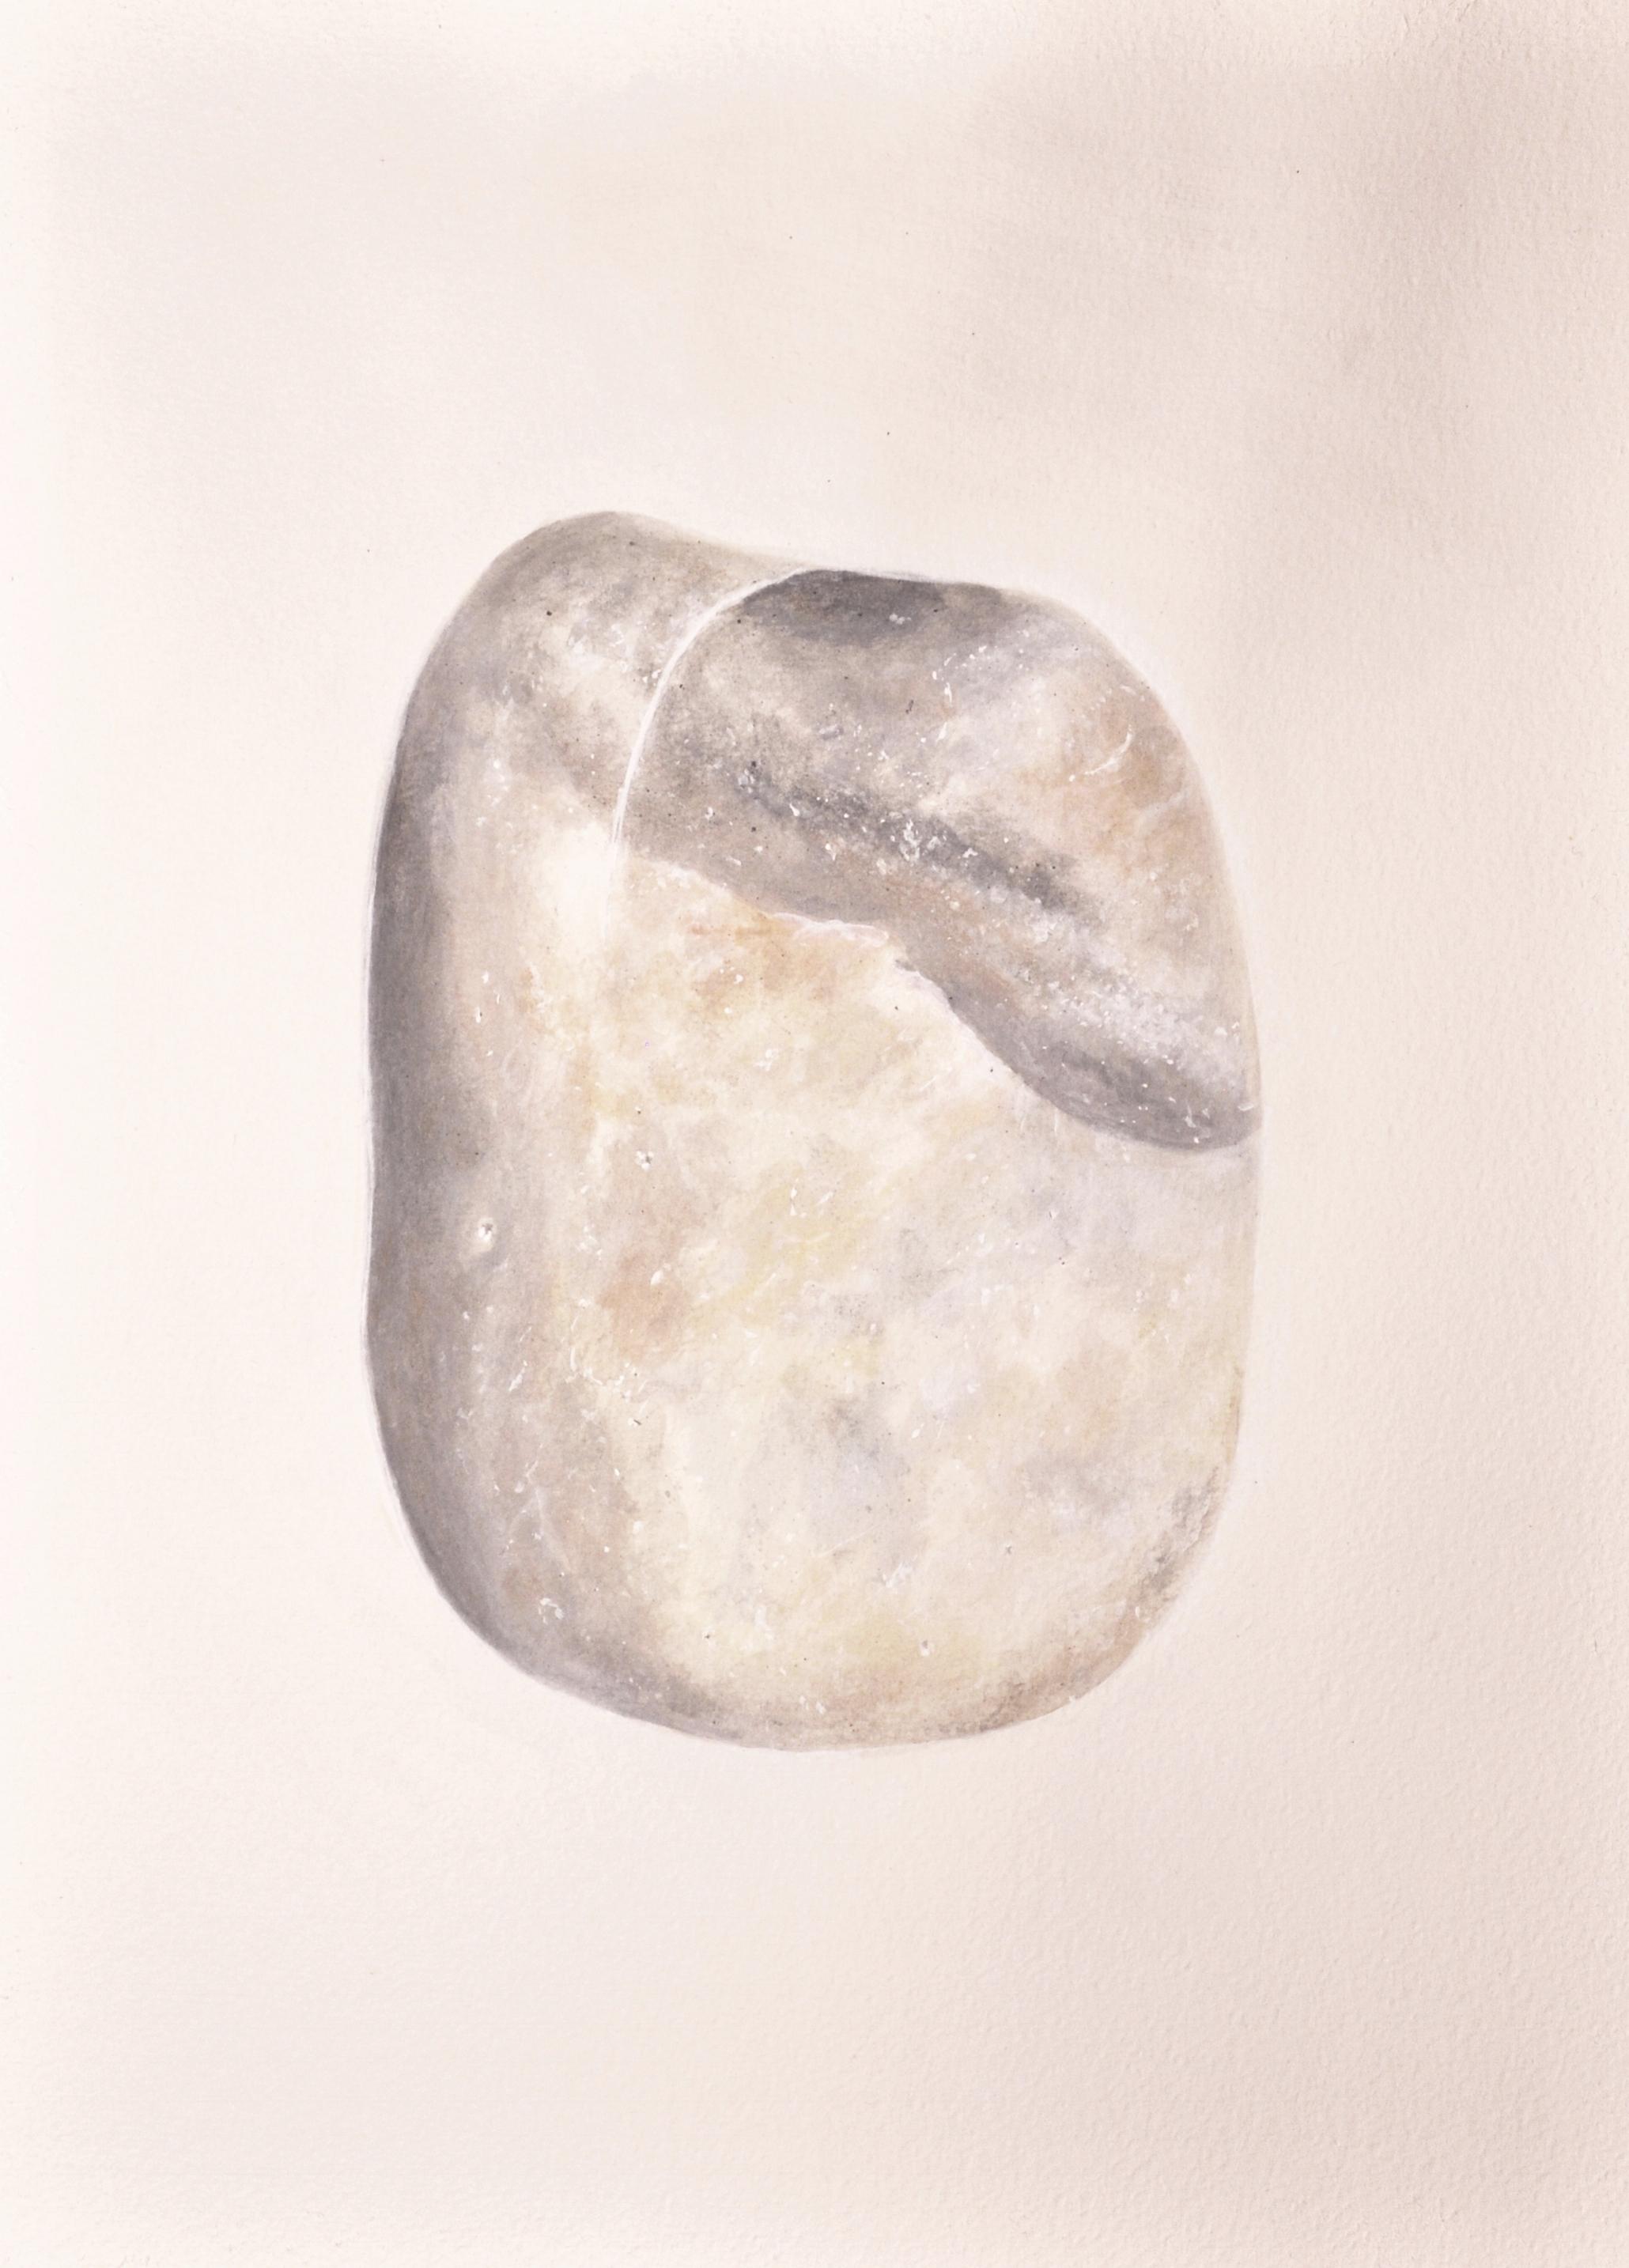 """Dina"" / Ashley Opperman / acrylic on paper / 15"" x 11"""